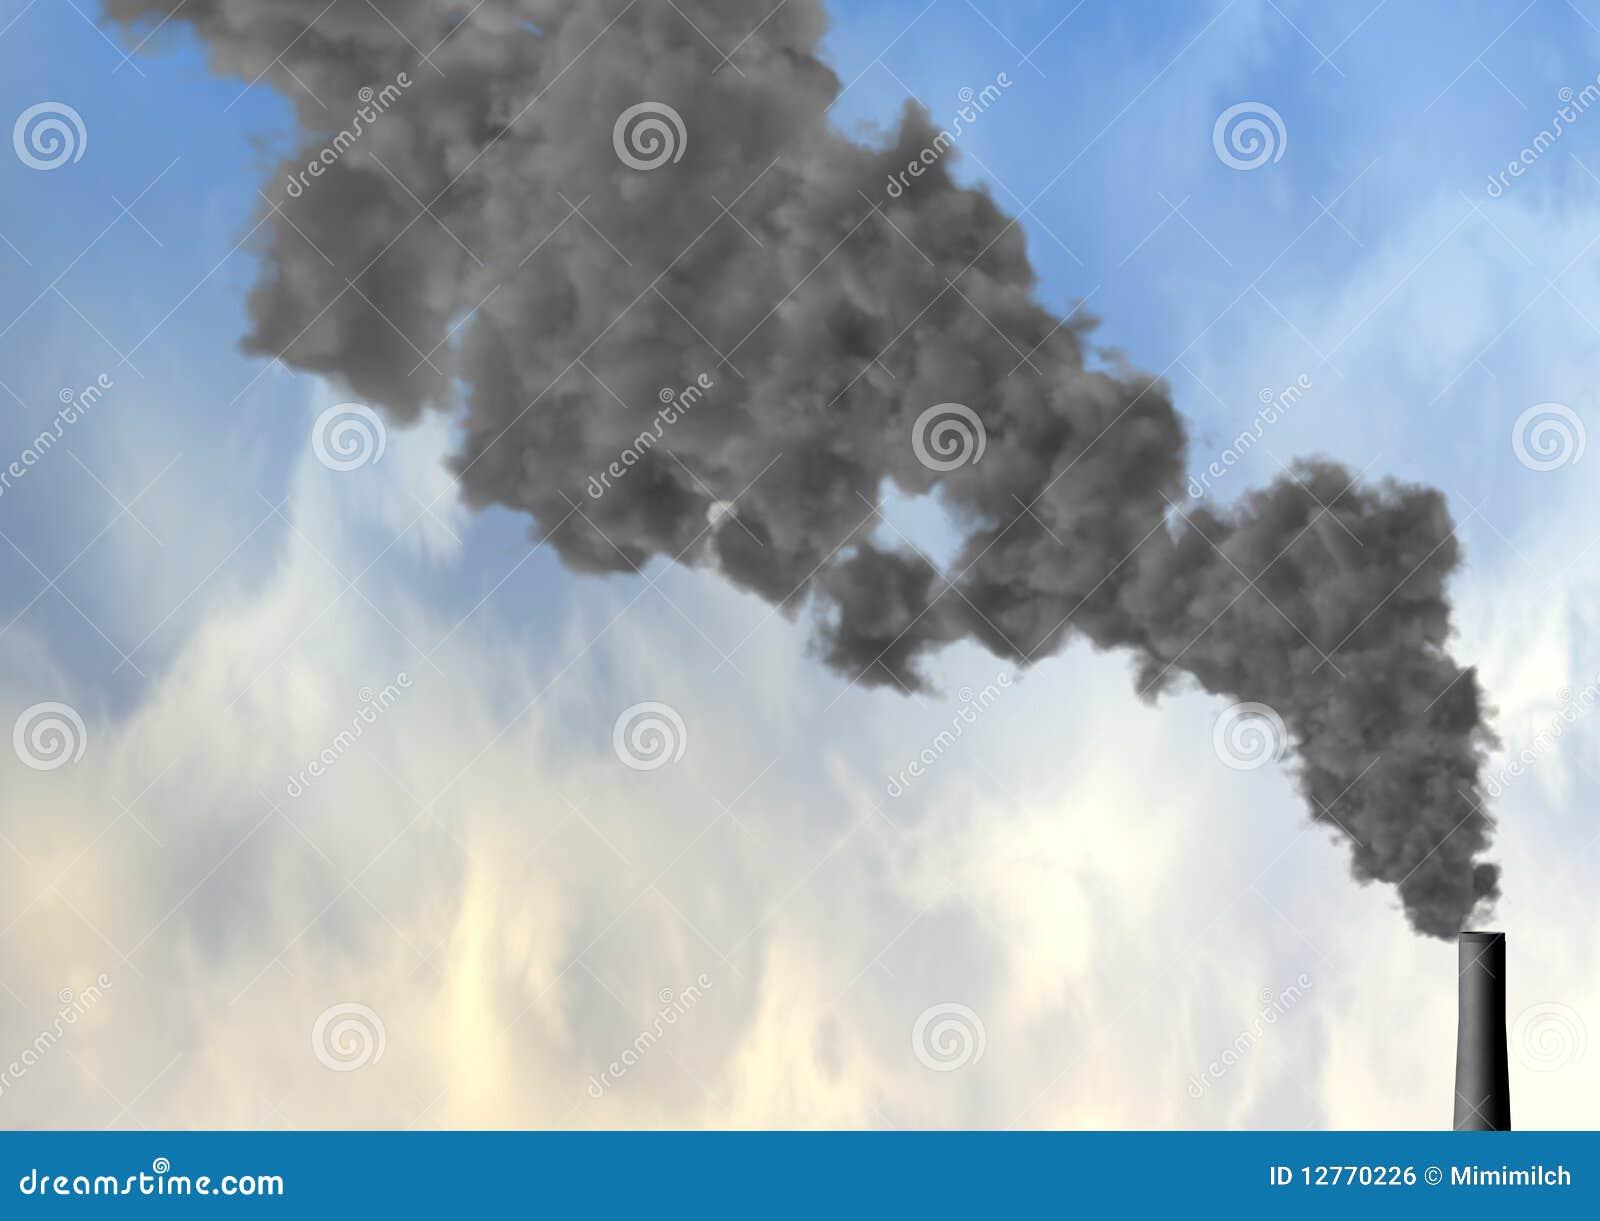 how to make a smoke free chimney